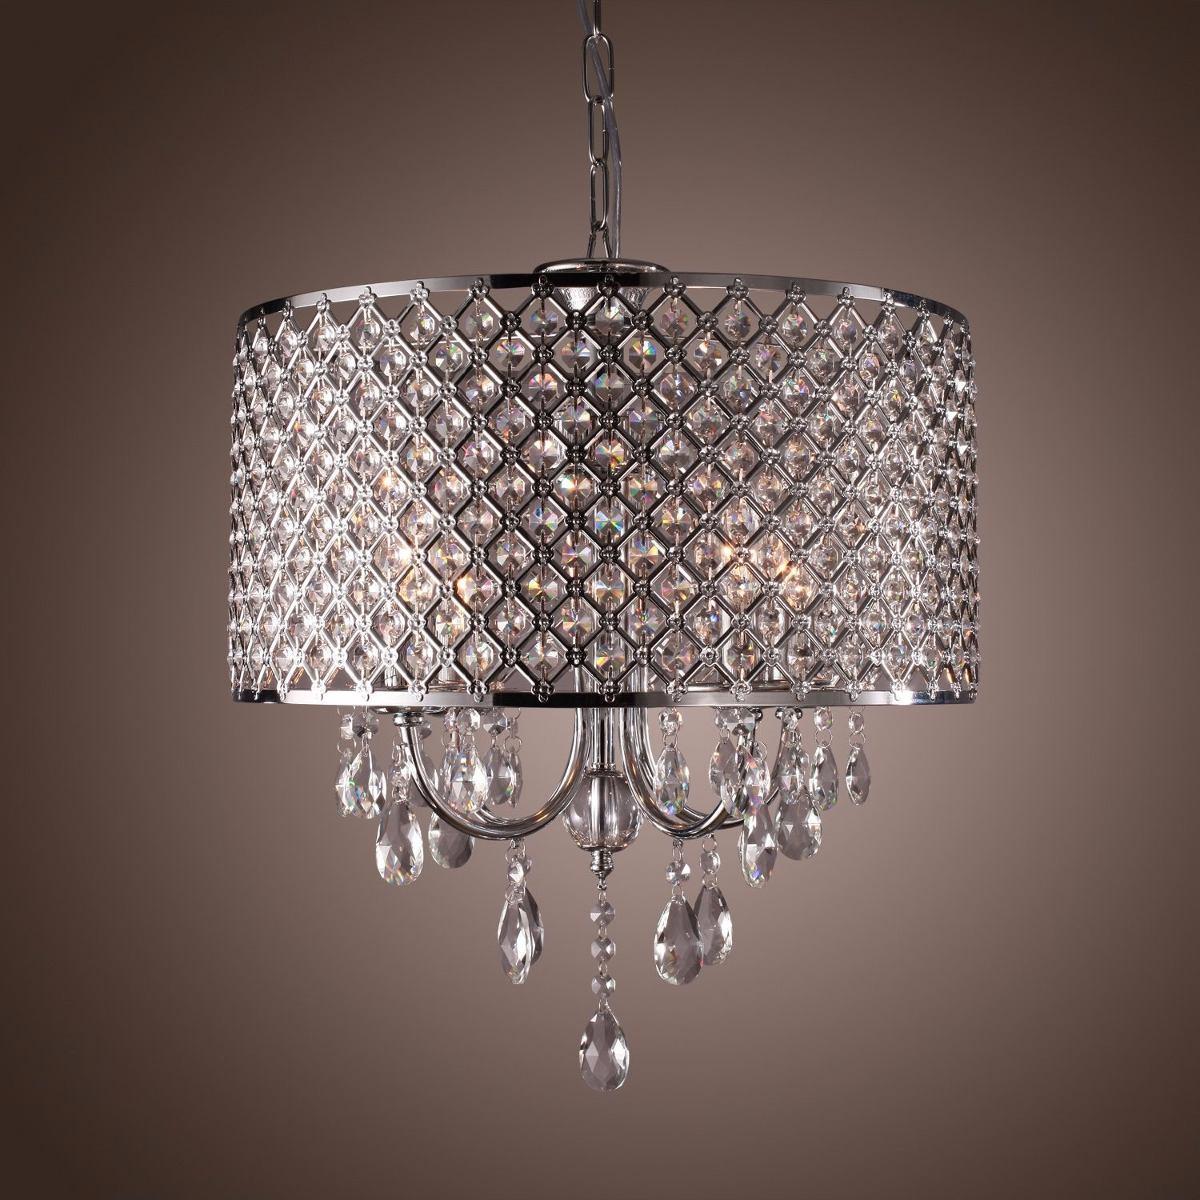 Lampara candil de cristal techo contemporanea moderna - Lamparas de cristal para techo ...